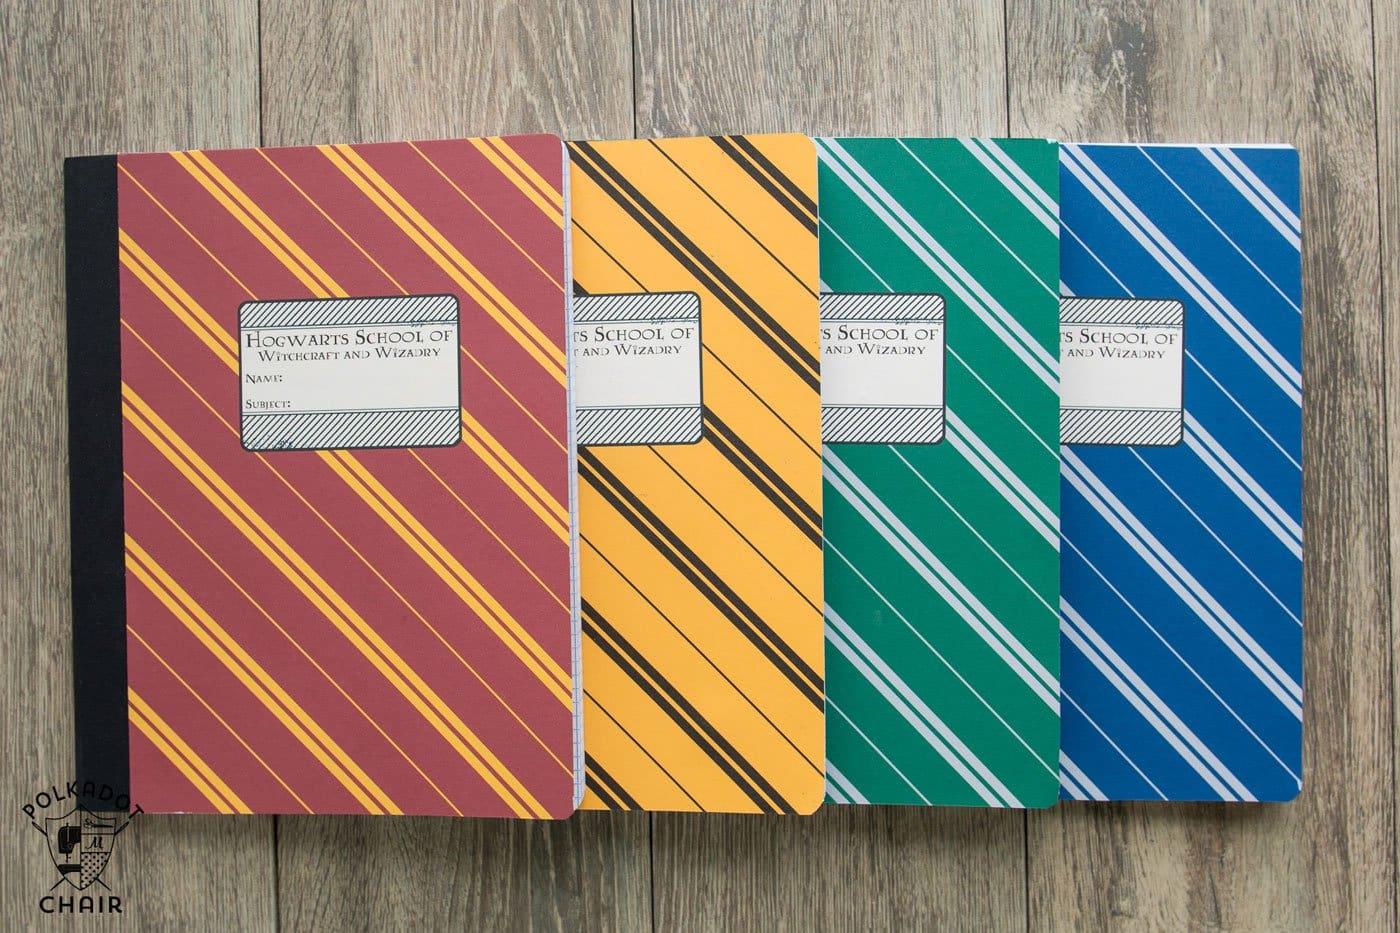 Diy Hogwarts Inspired House Notebooks Harry Potter Craft Idea